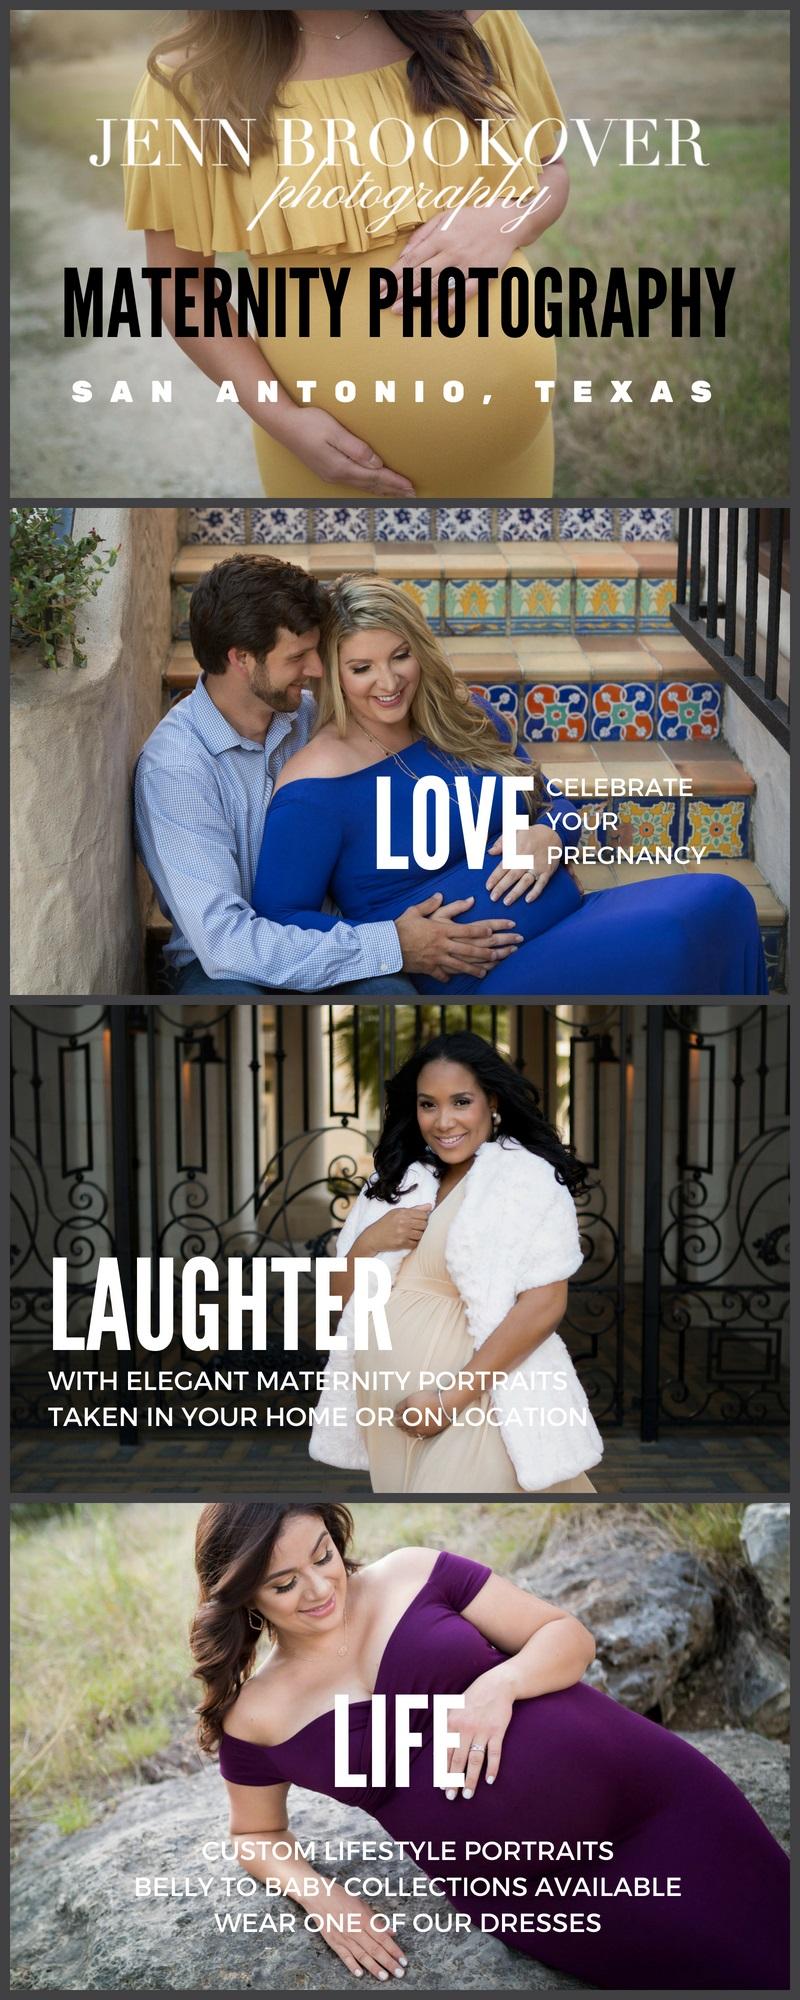 Maternity Photographer | jennbrookover.com